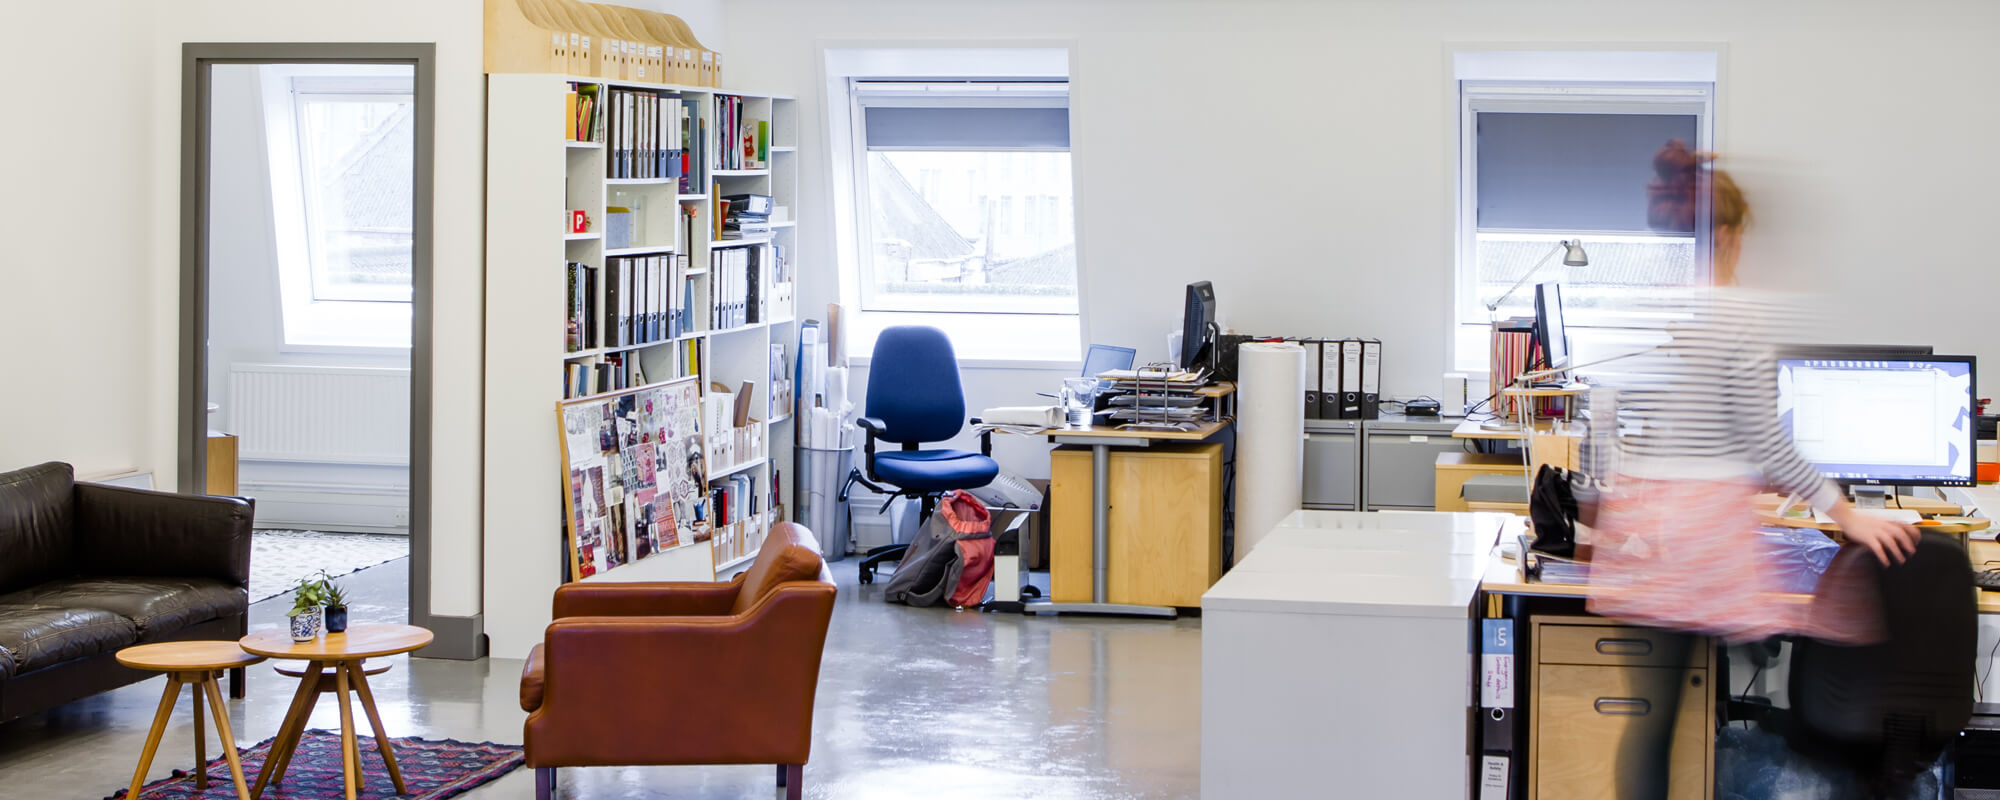 utilityhouse-bristol-office-space-6.jpg